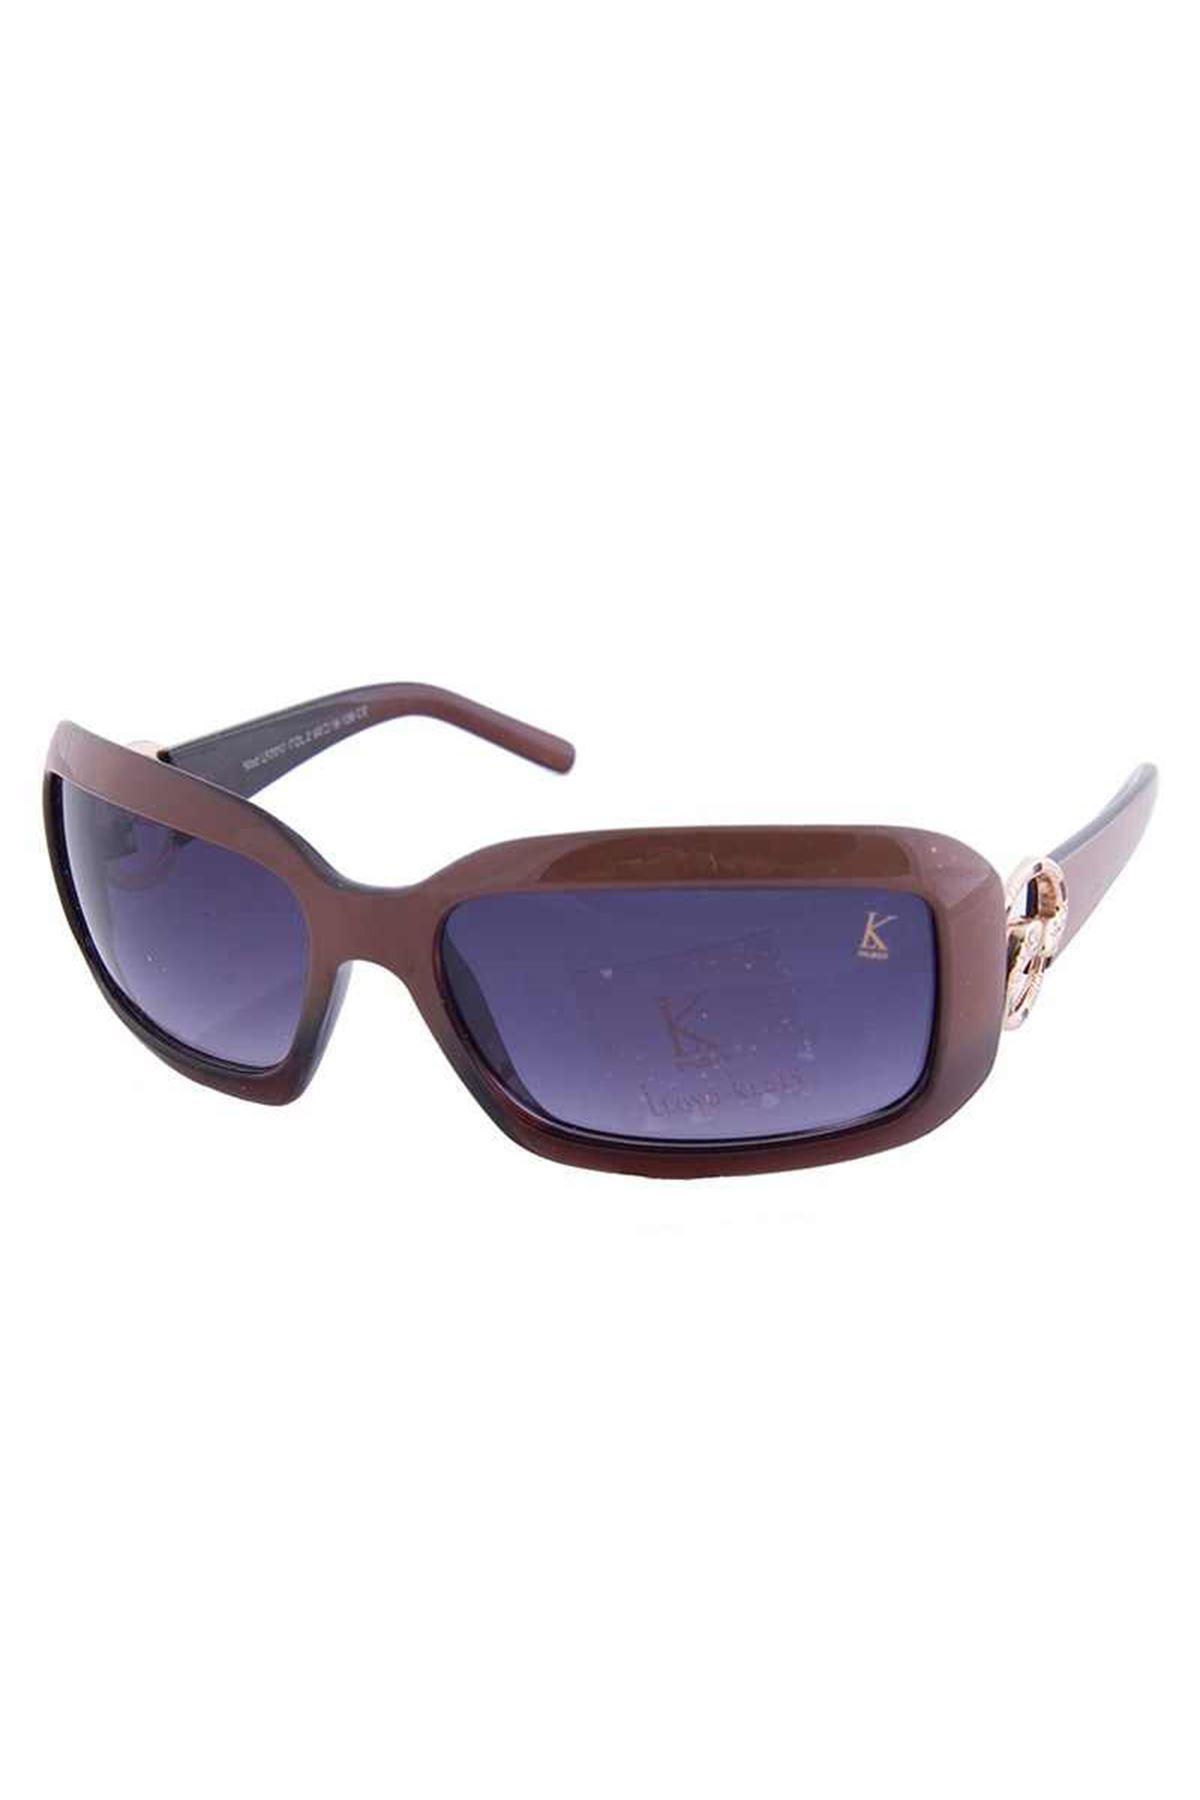 Lloyd Klein Güneş Gözlüğü 30A-72690